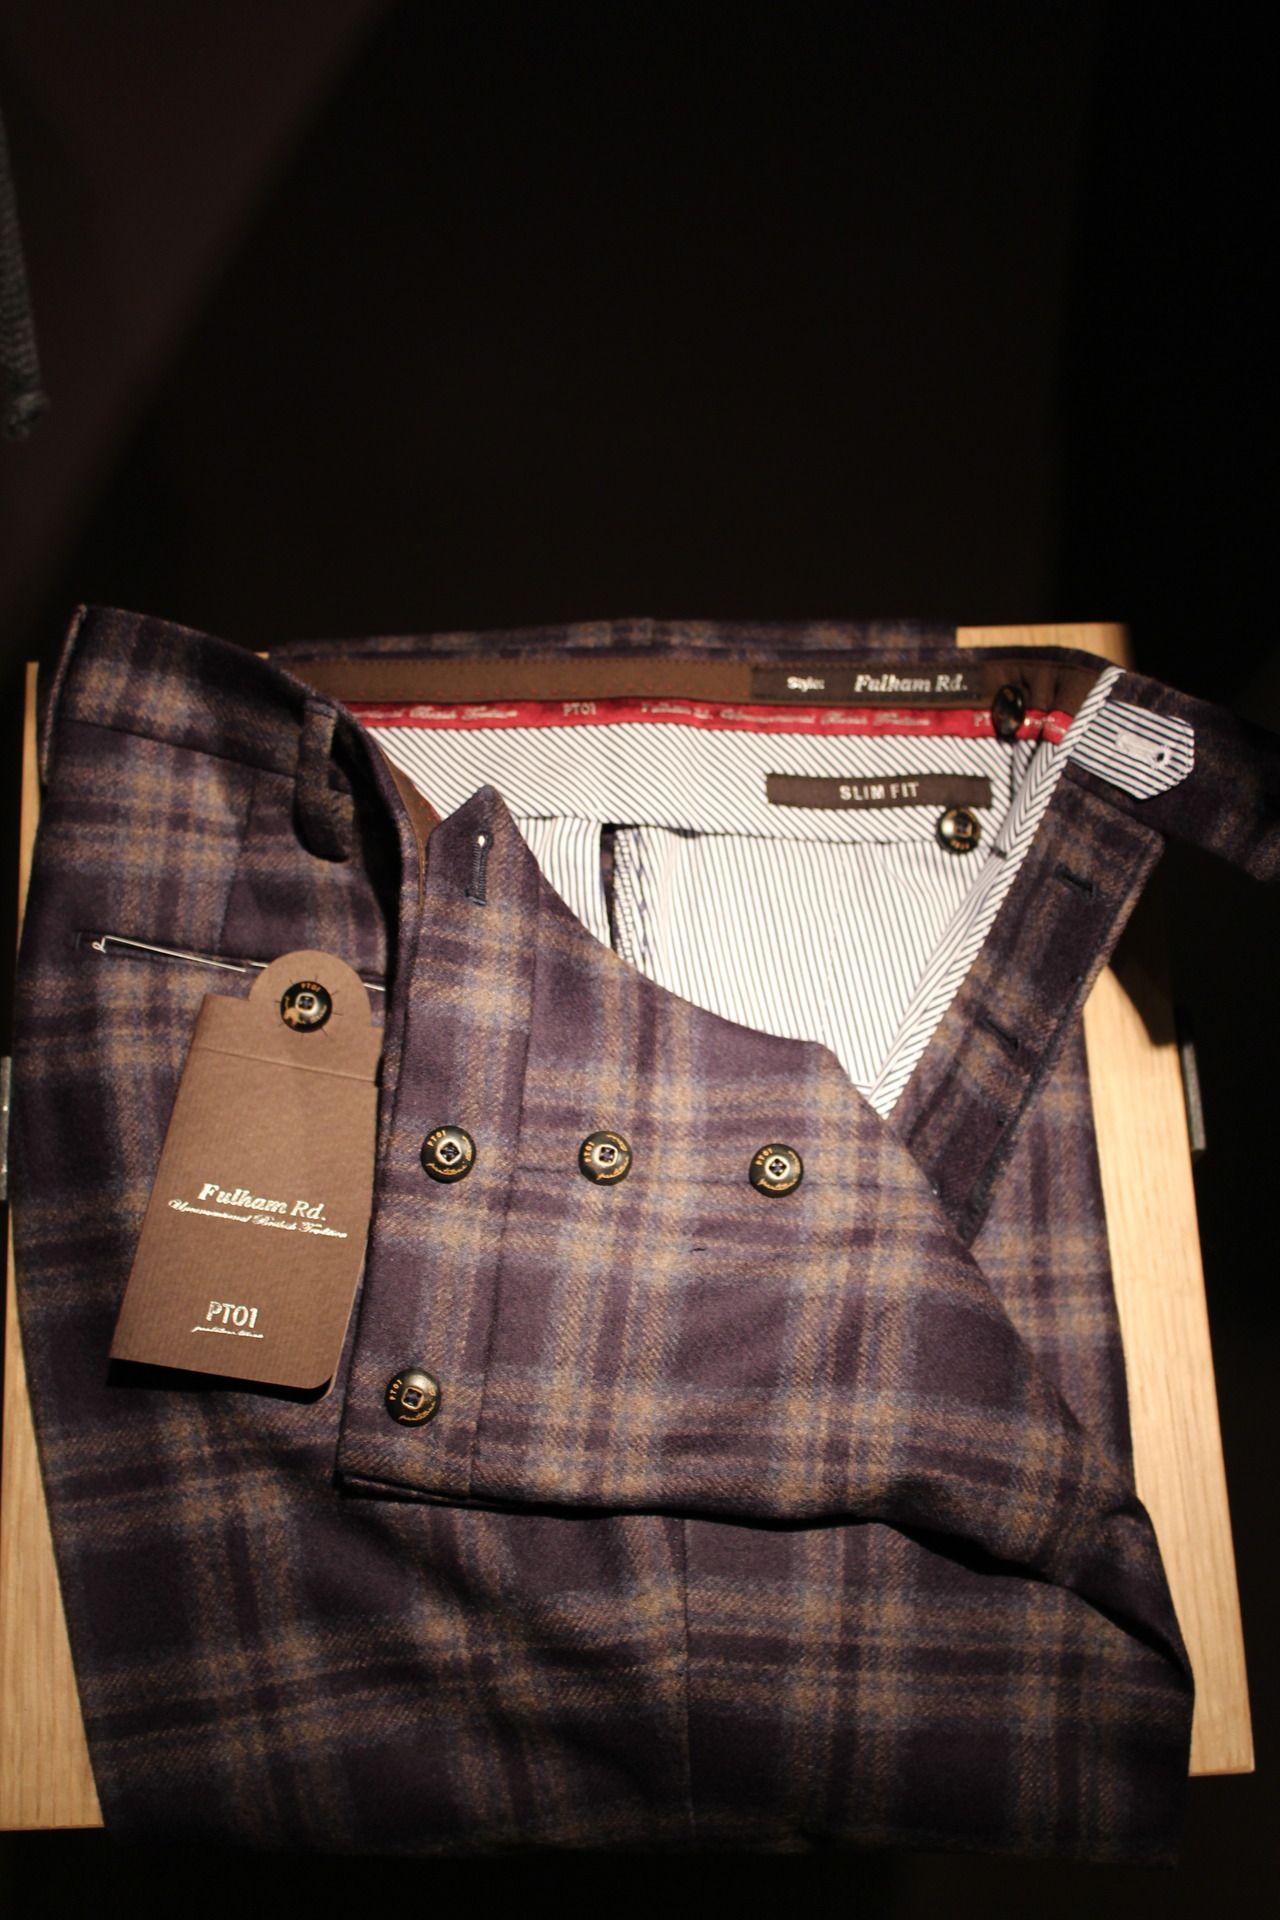 Pantaloni Torino @ Pitti Uomo 85° | Pantaloni, Abbigliamento